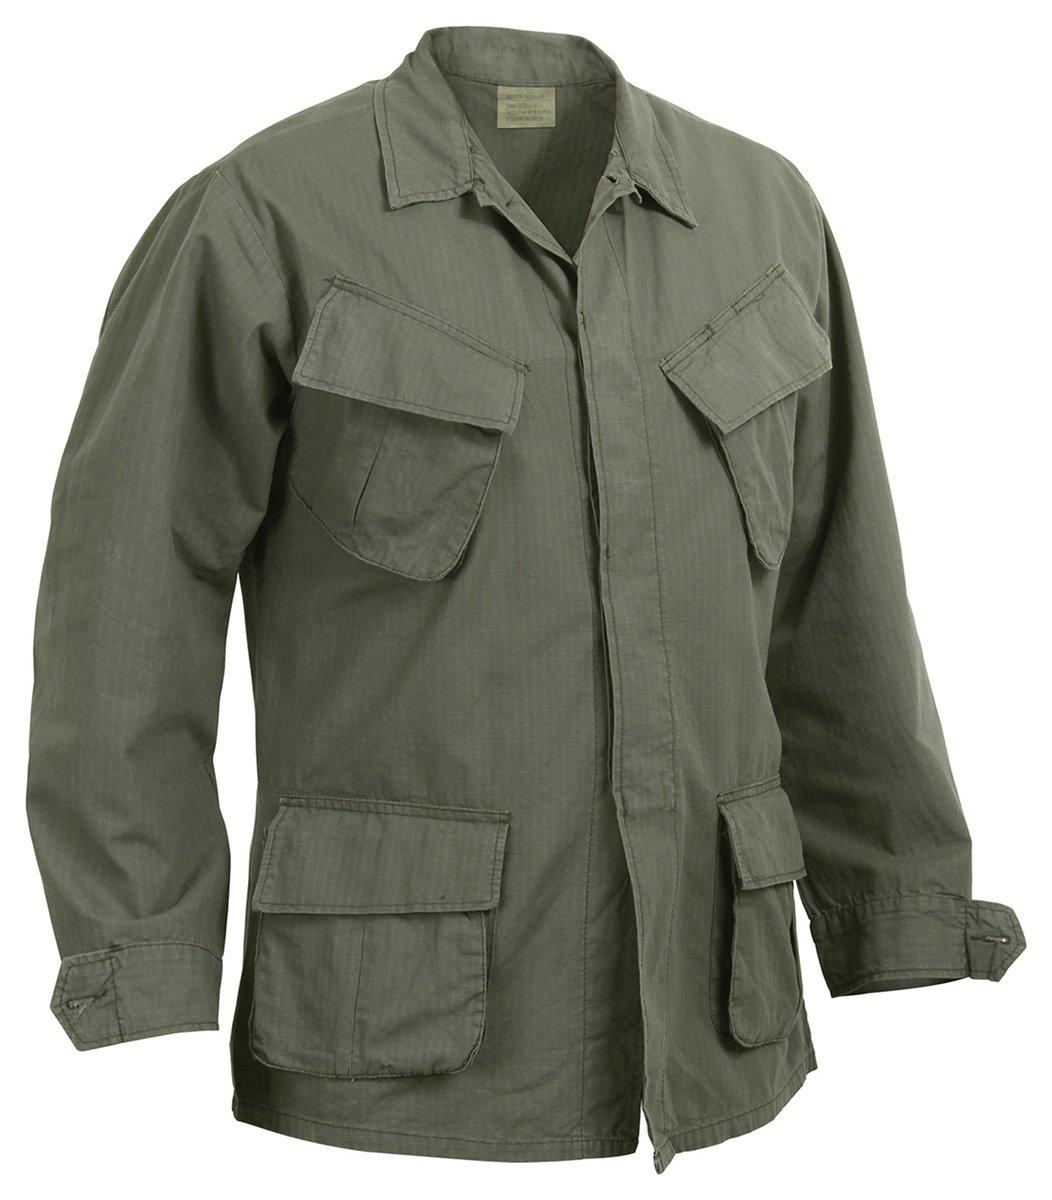 Rothco R/S Vintage Vietnam Fatigue Shirt 4688